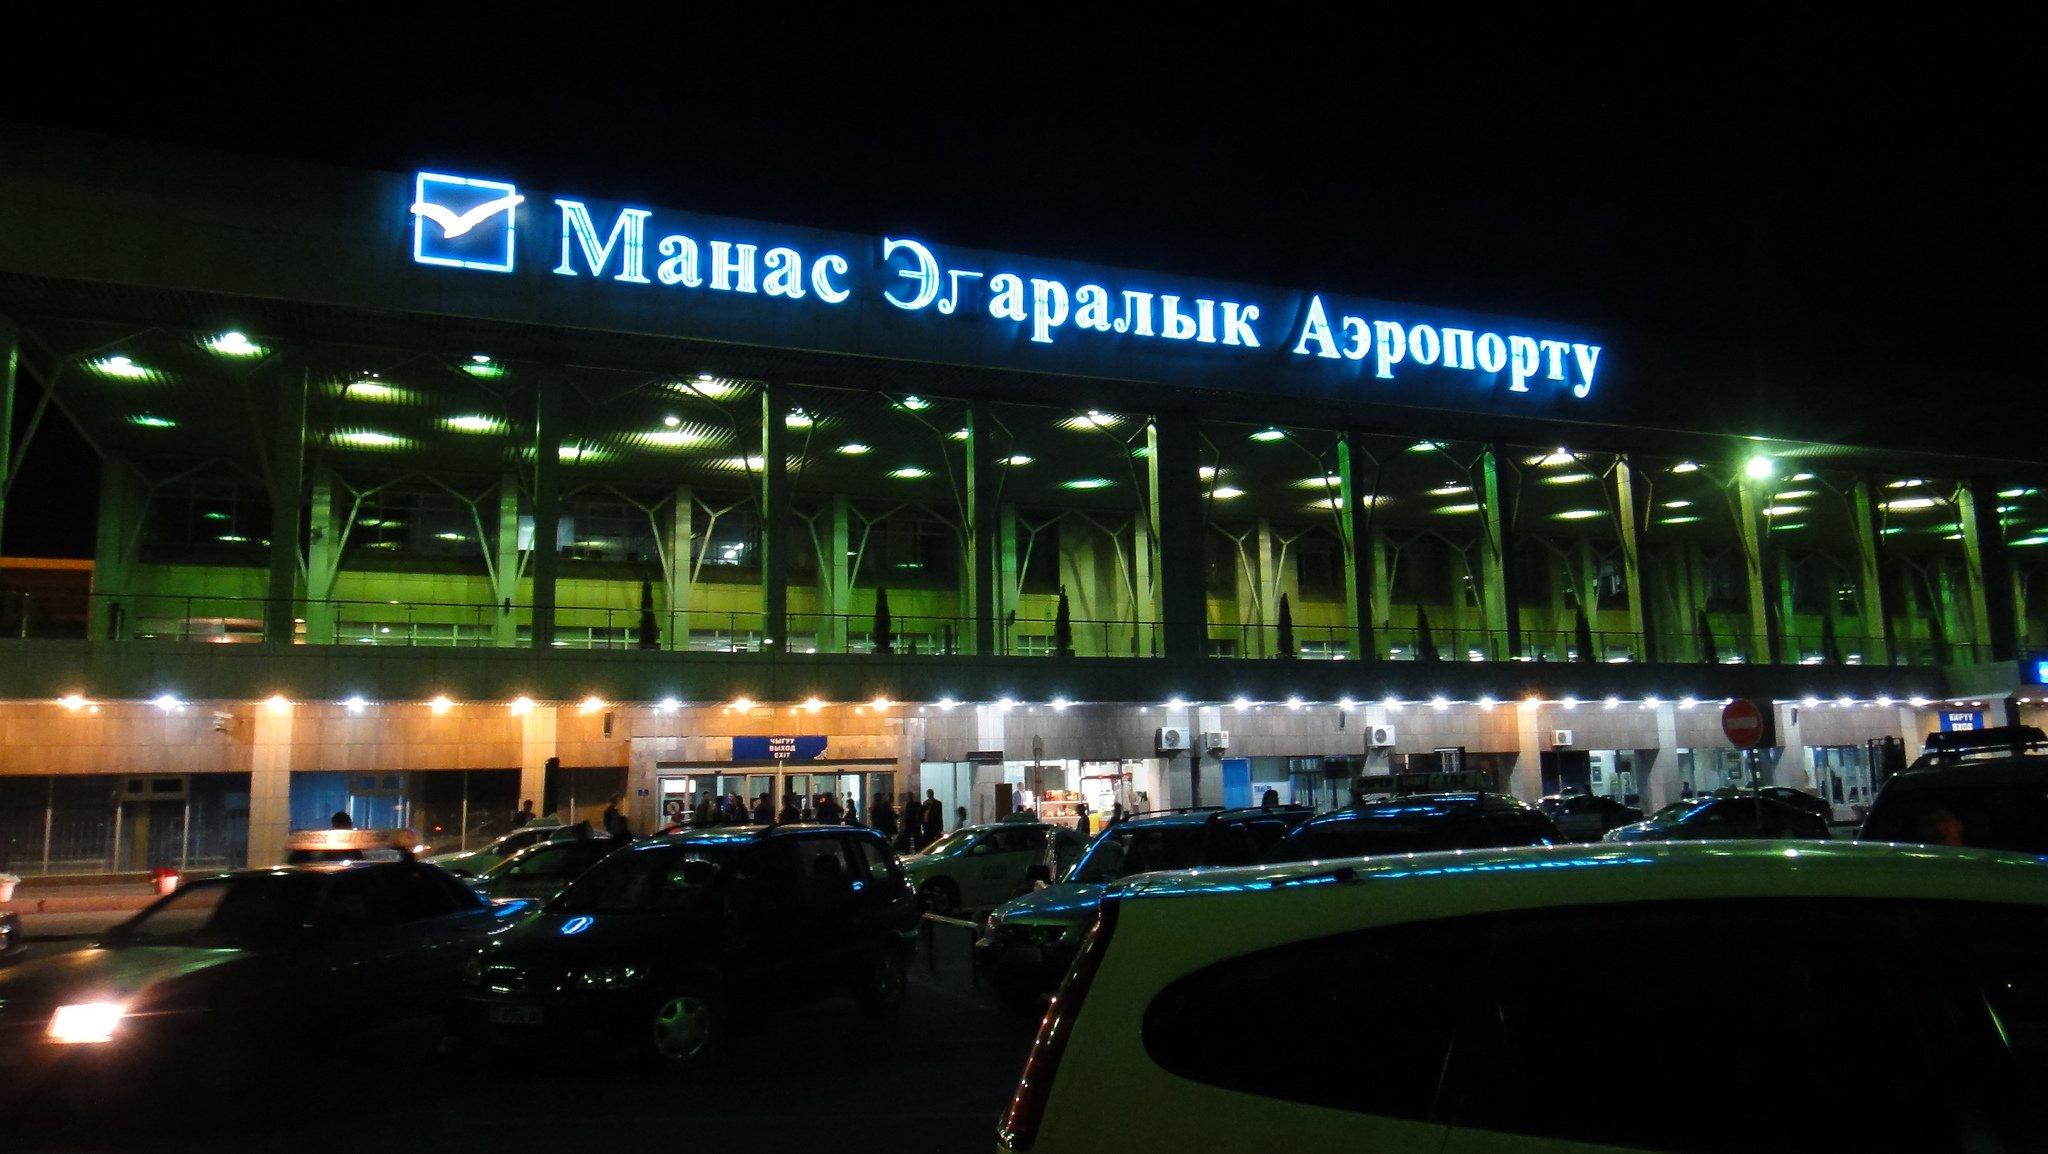 Киргизия загранпаспорт нужен